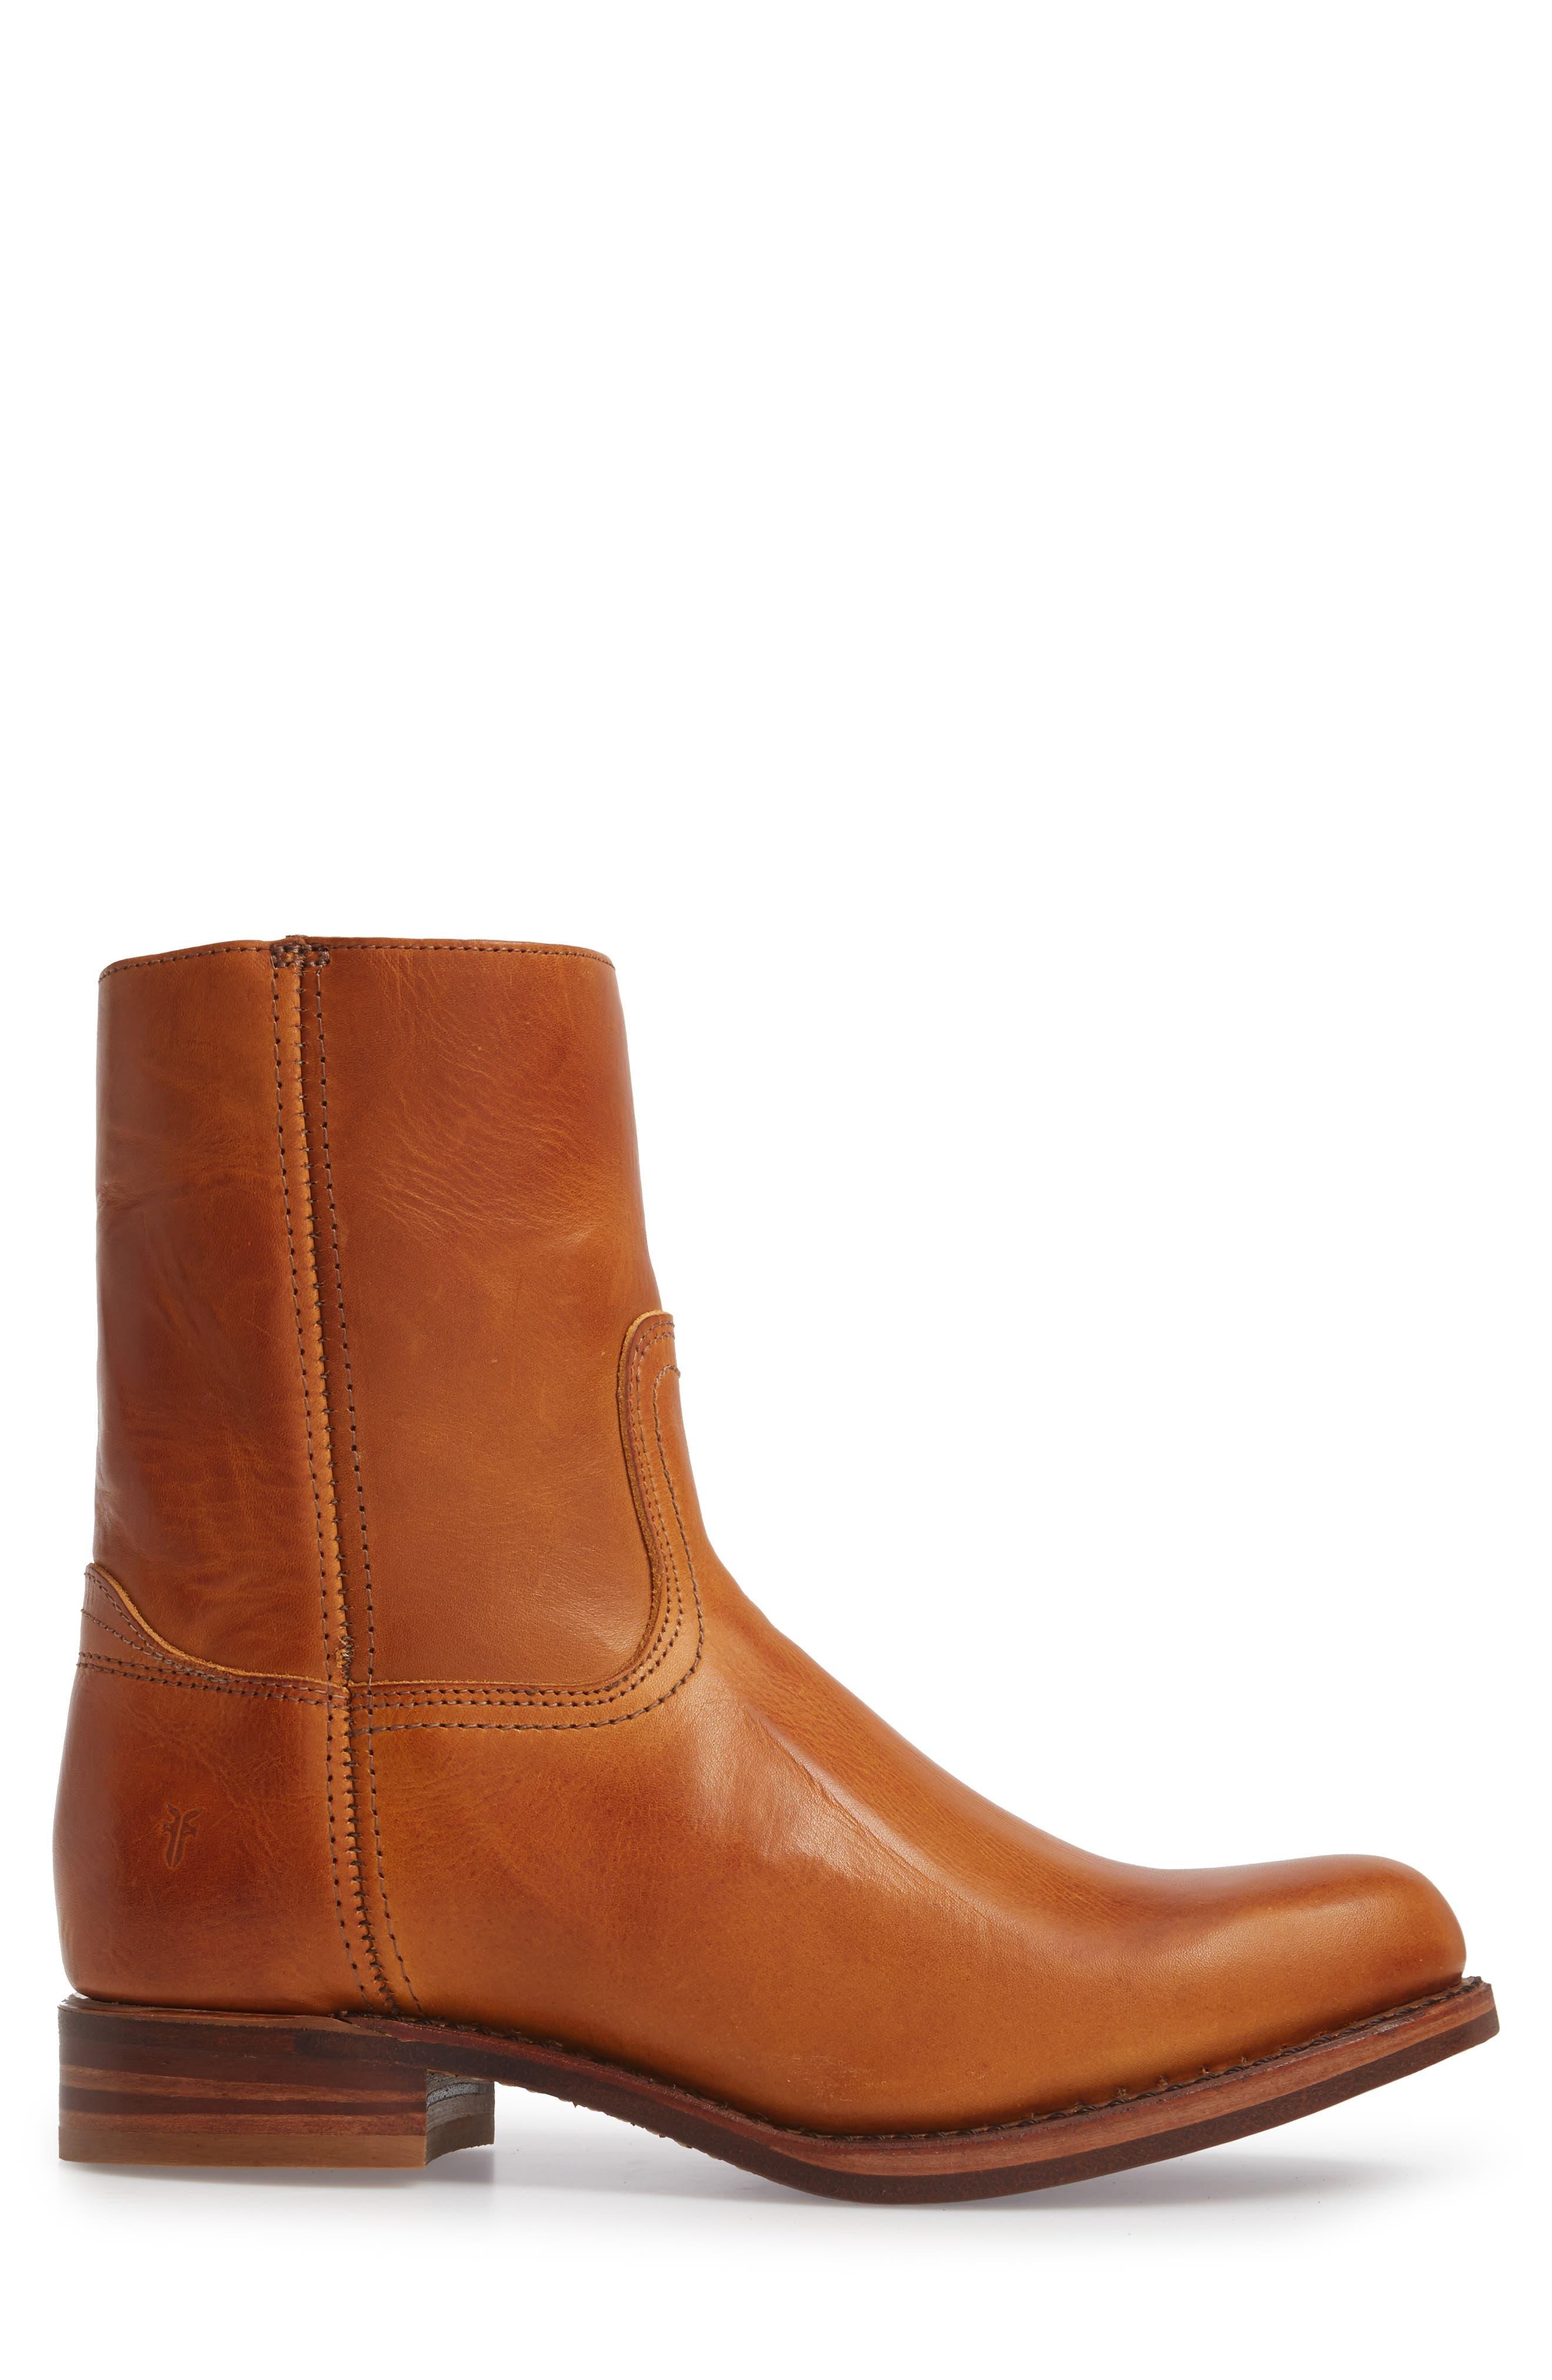 Campus Side Zip Boot,                             Alternate thumbnail 3, color,                             Cognac Leather